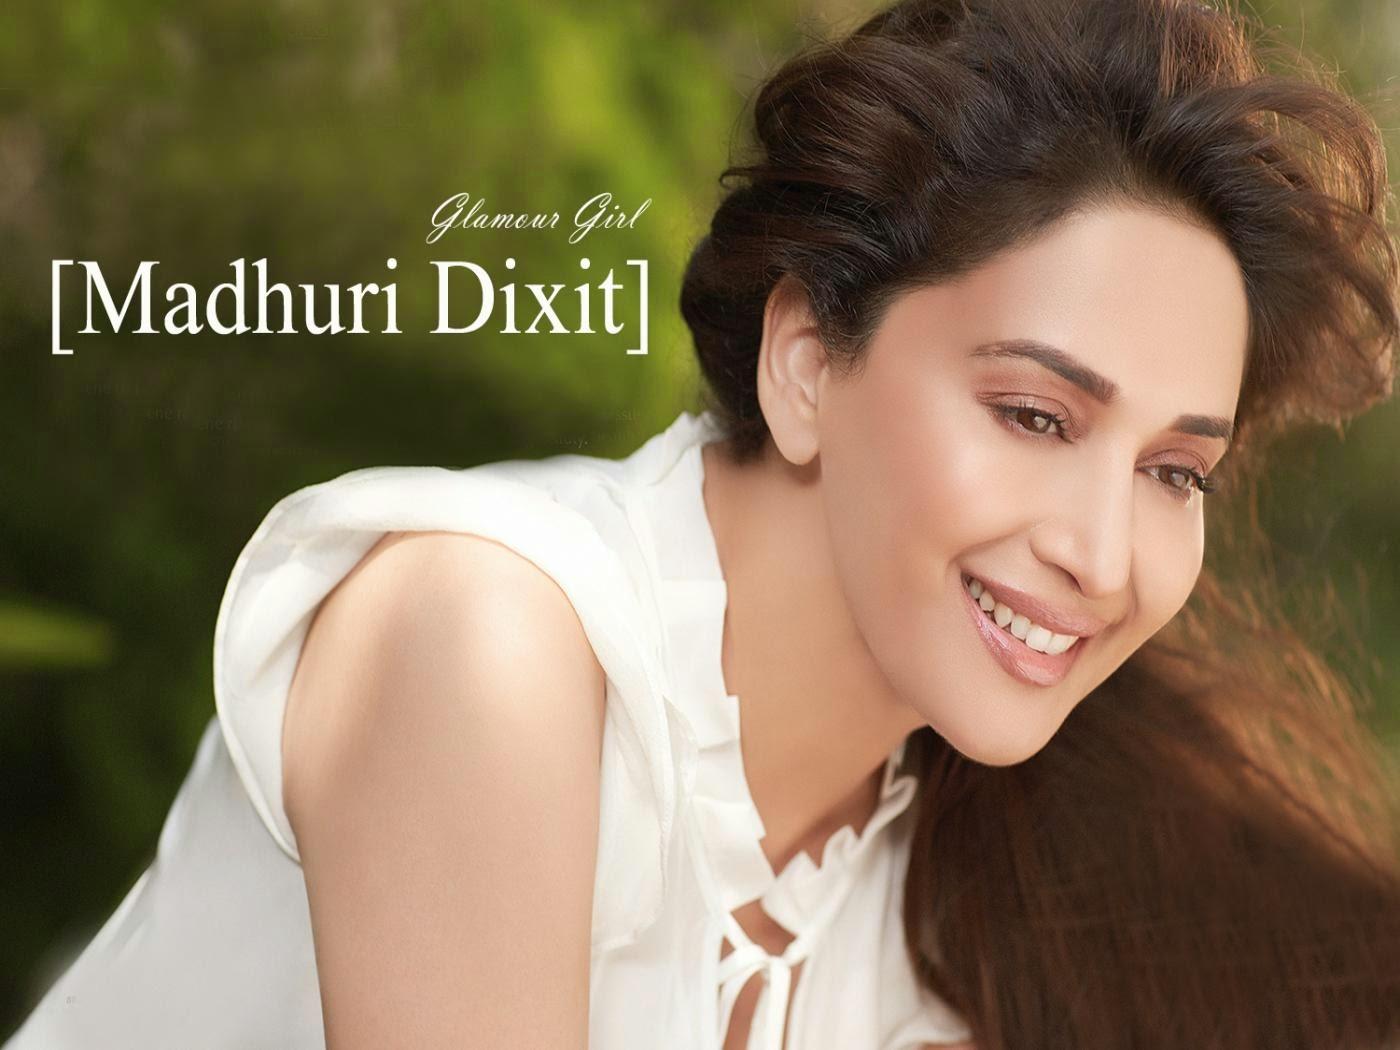 Hot Indian Bollywood Actress Madhuri Dixit HD Photos Free Download